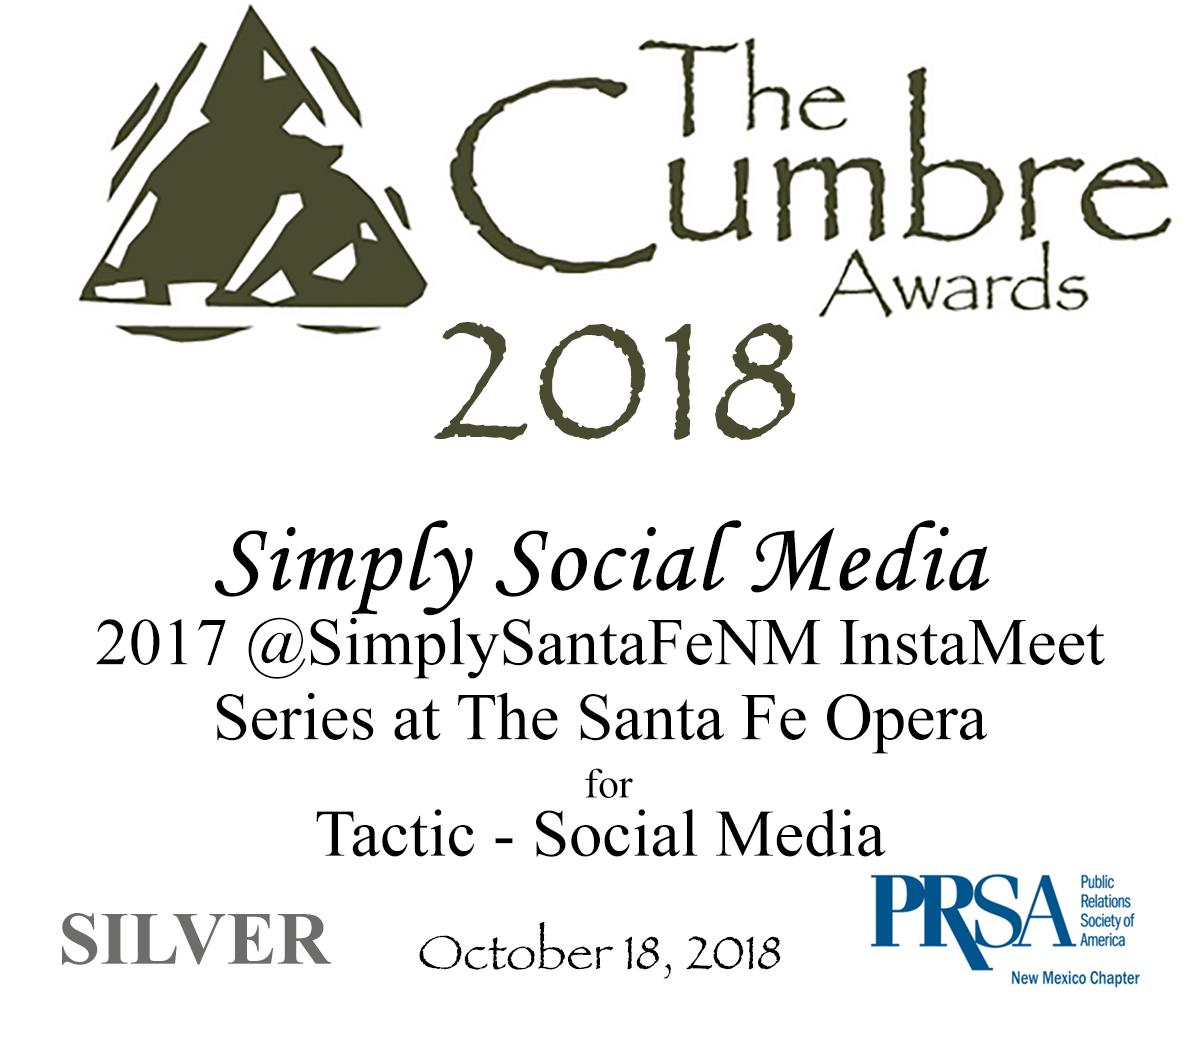 Simply Social Media 2017 sfo InstaMeet Silver Cumbre Award 2018.jpg